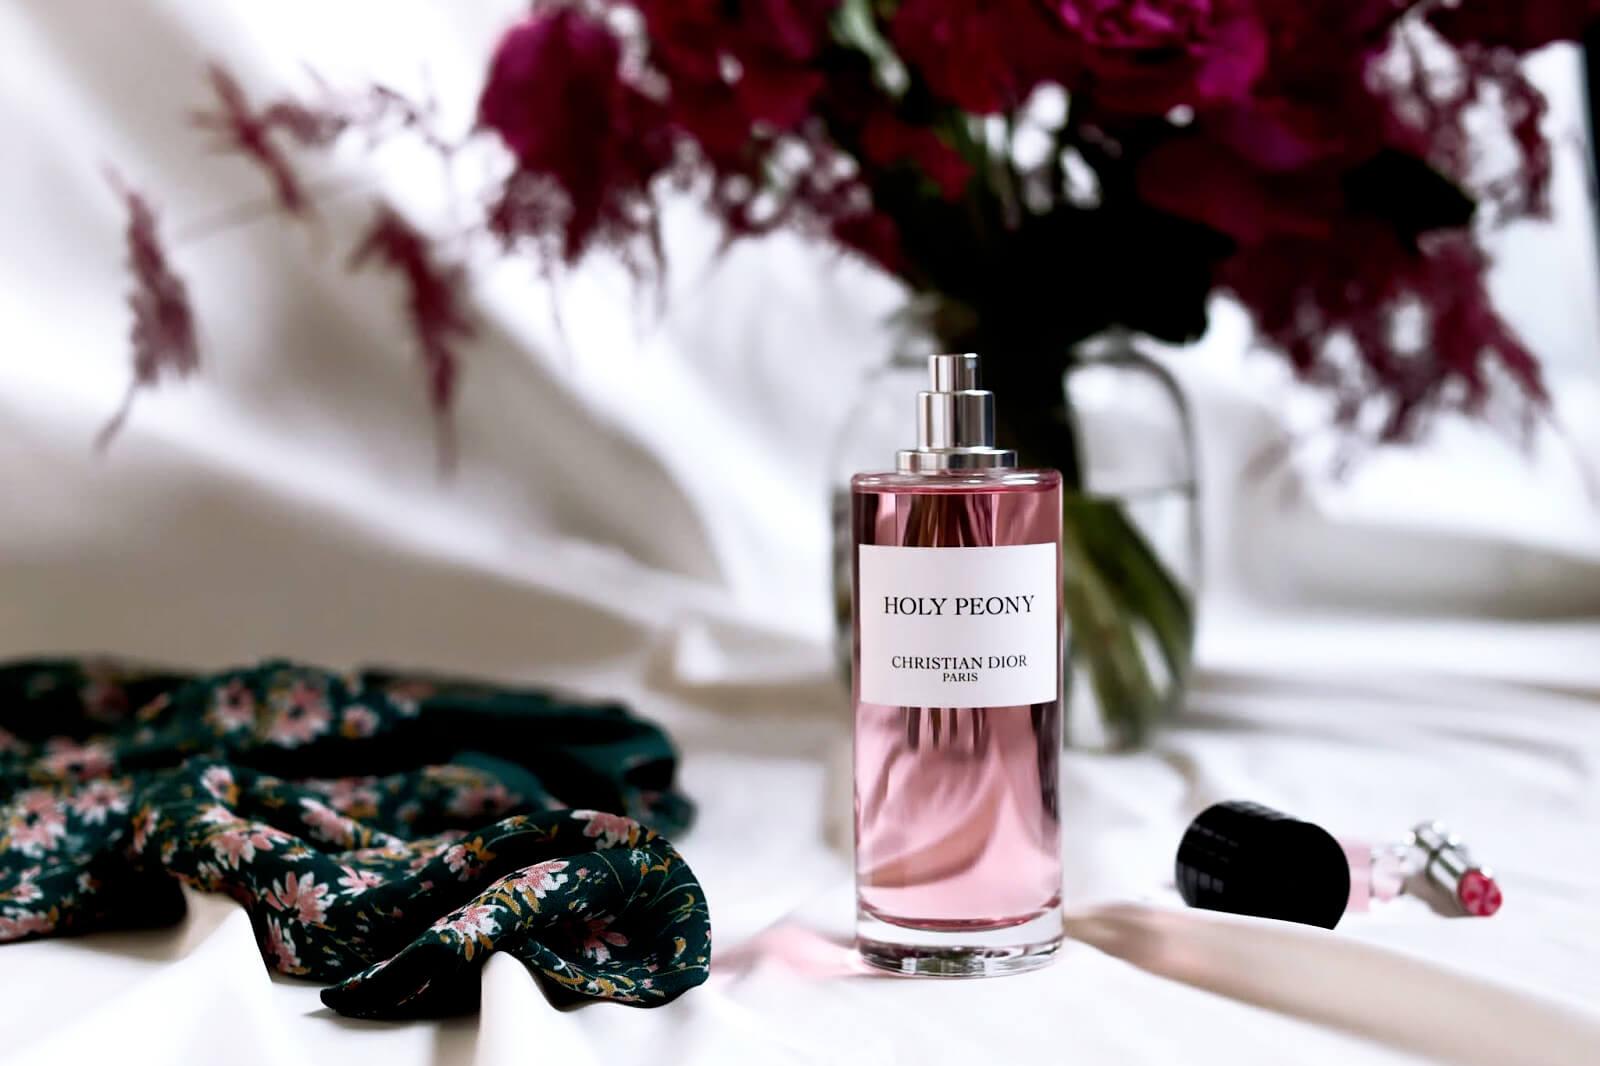 maisonchristian-dior-holy-peony-parfum-avis-test